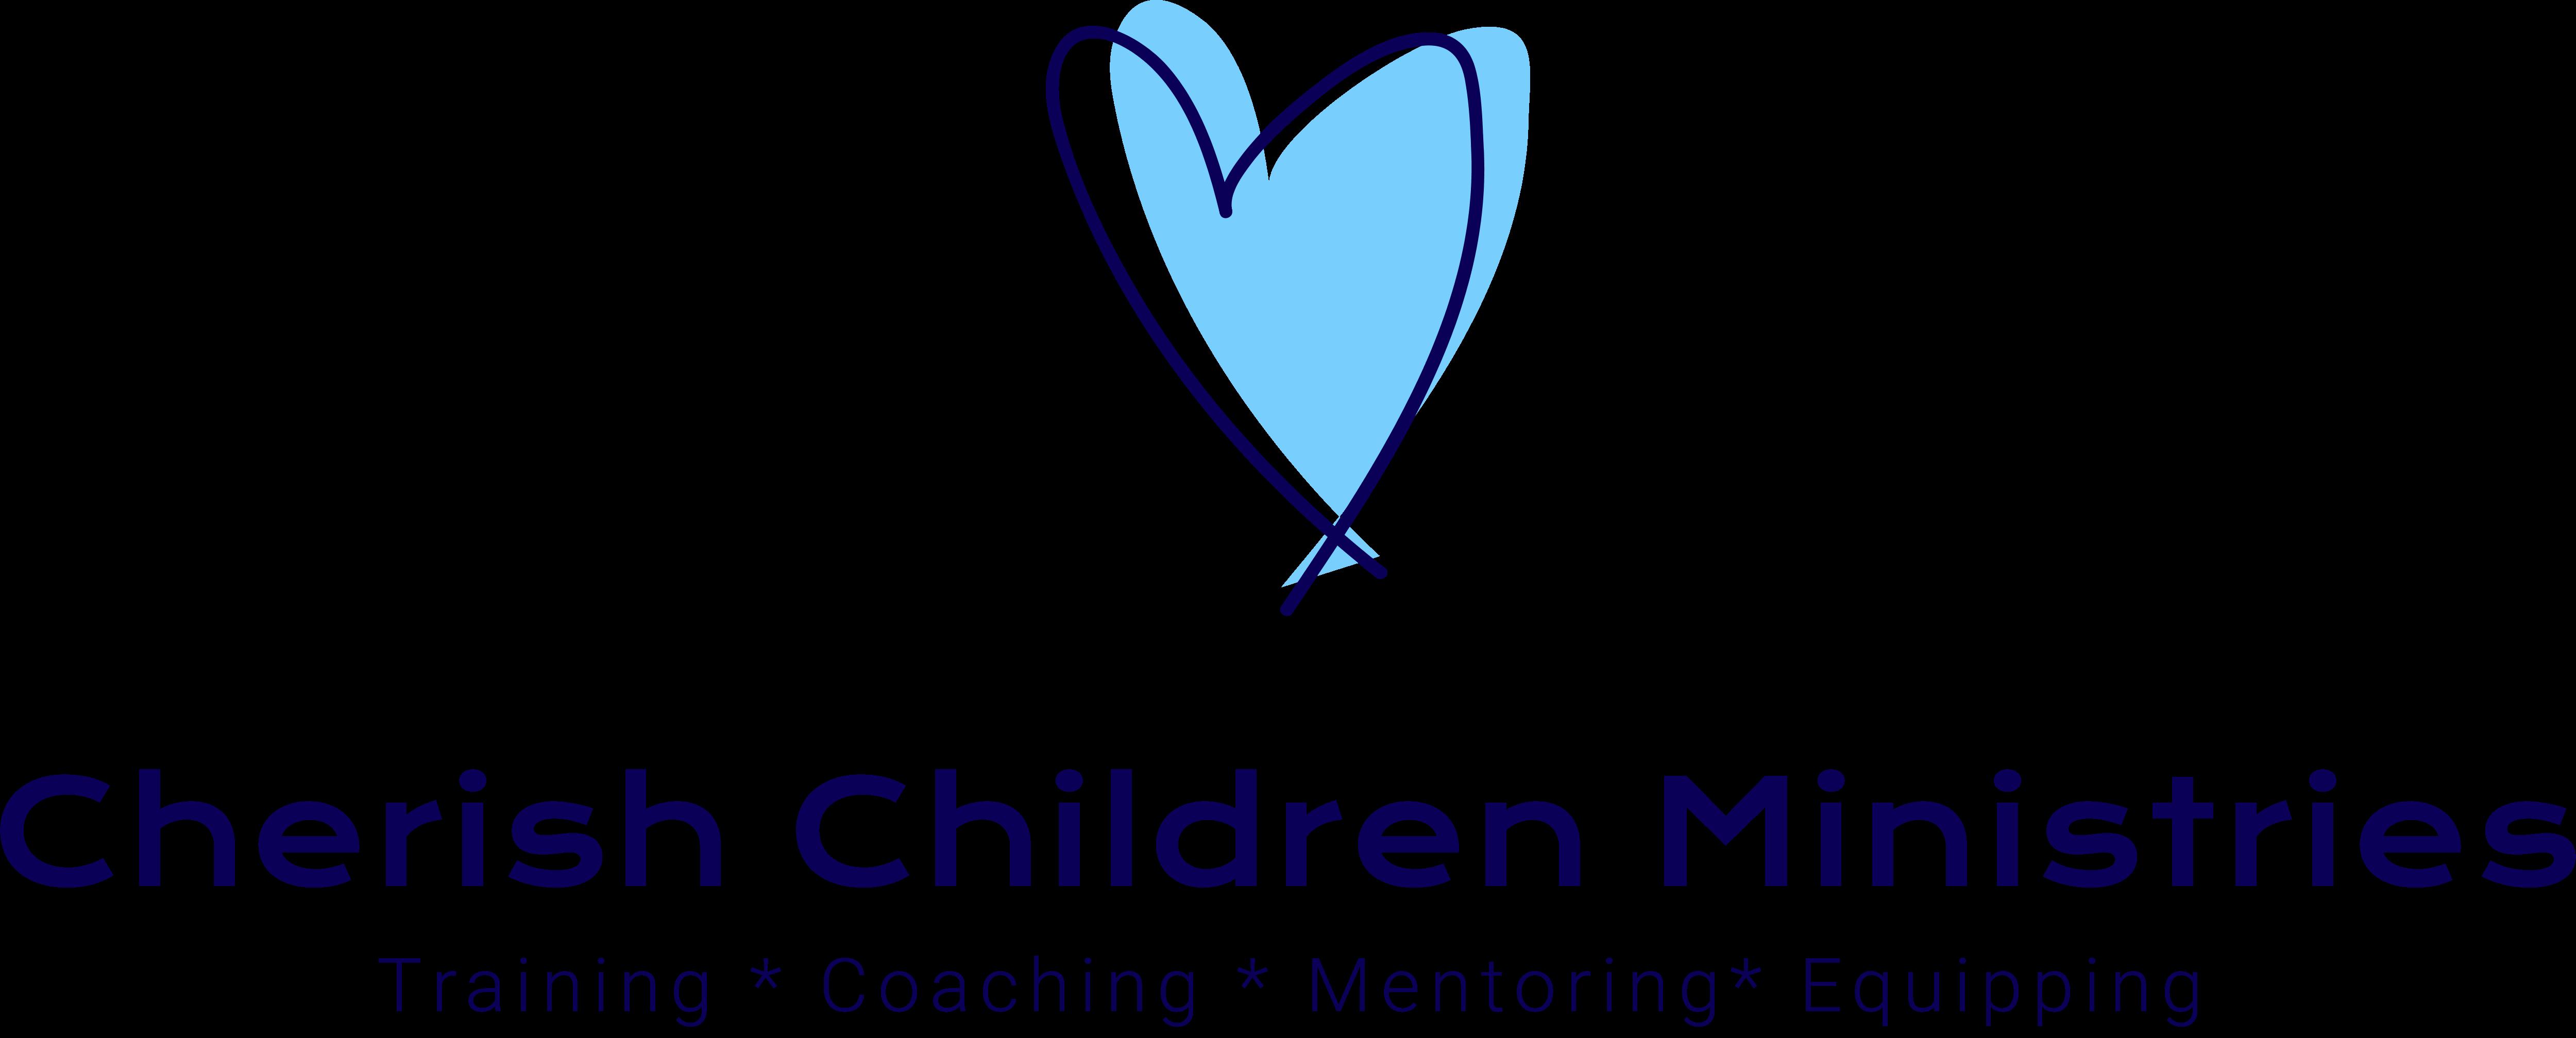 Cherish Children Ministries